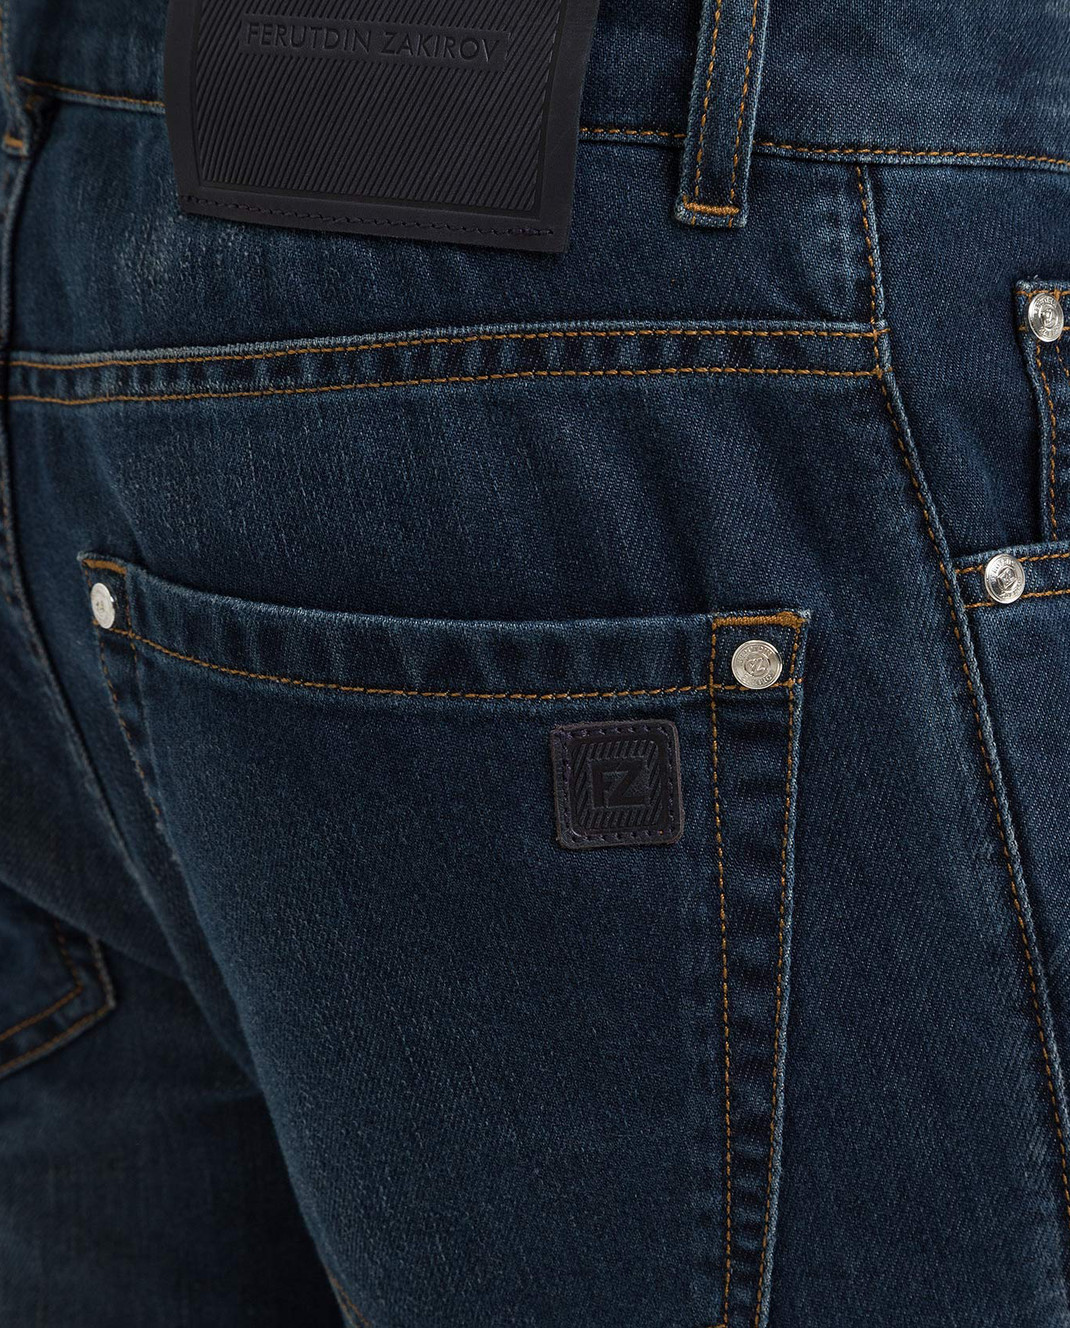 Ferutdin Zakirov Темно-синие джинсы FZA4900JN4000 изображение 5